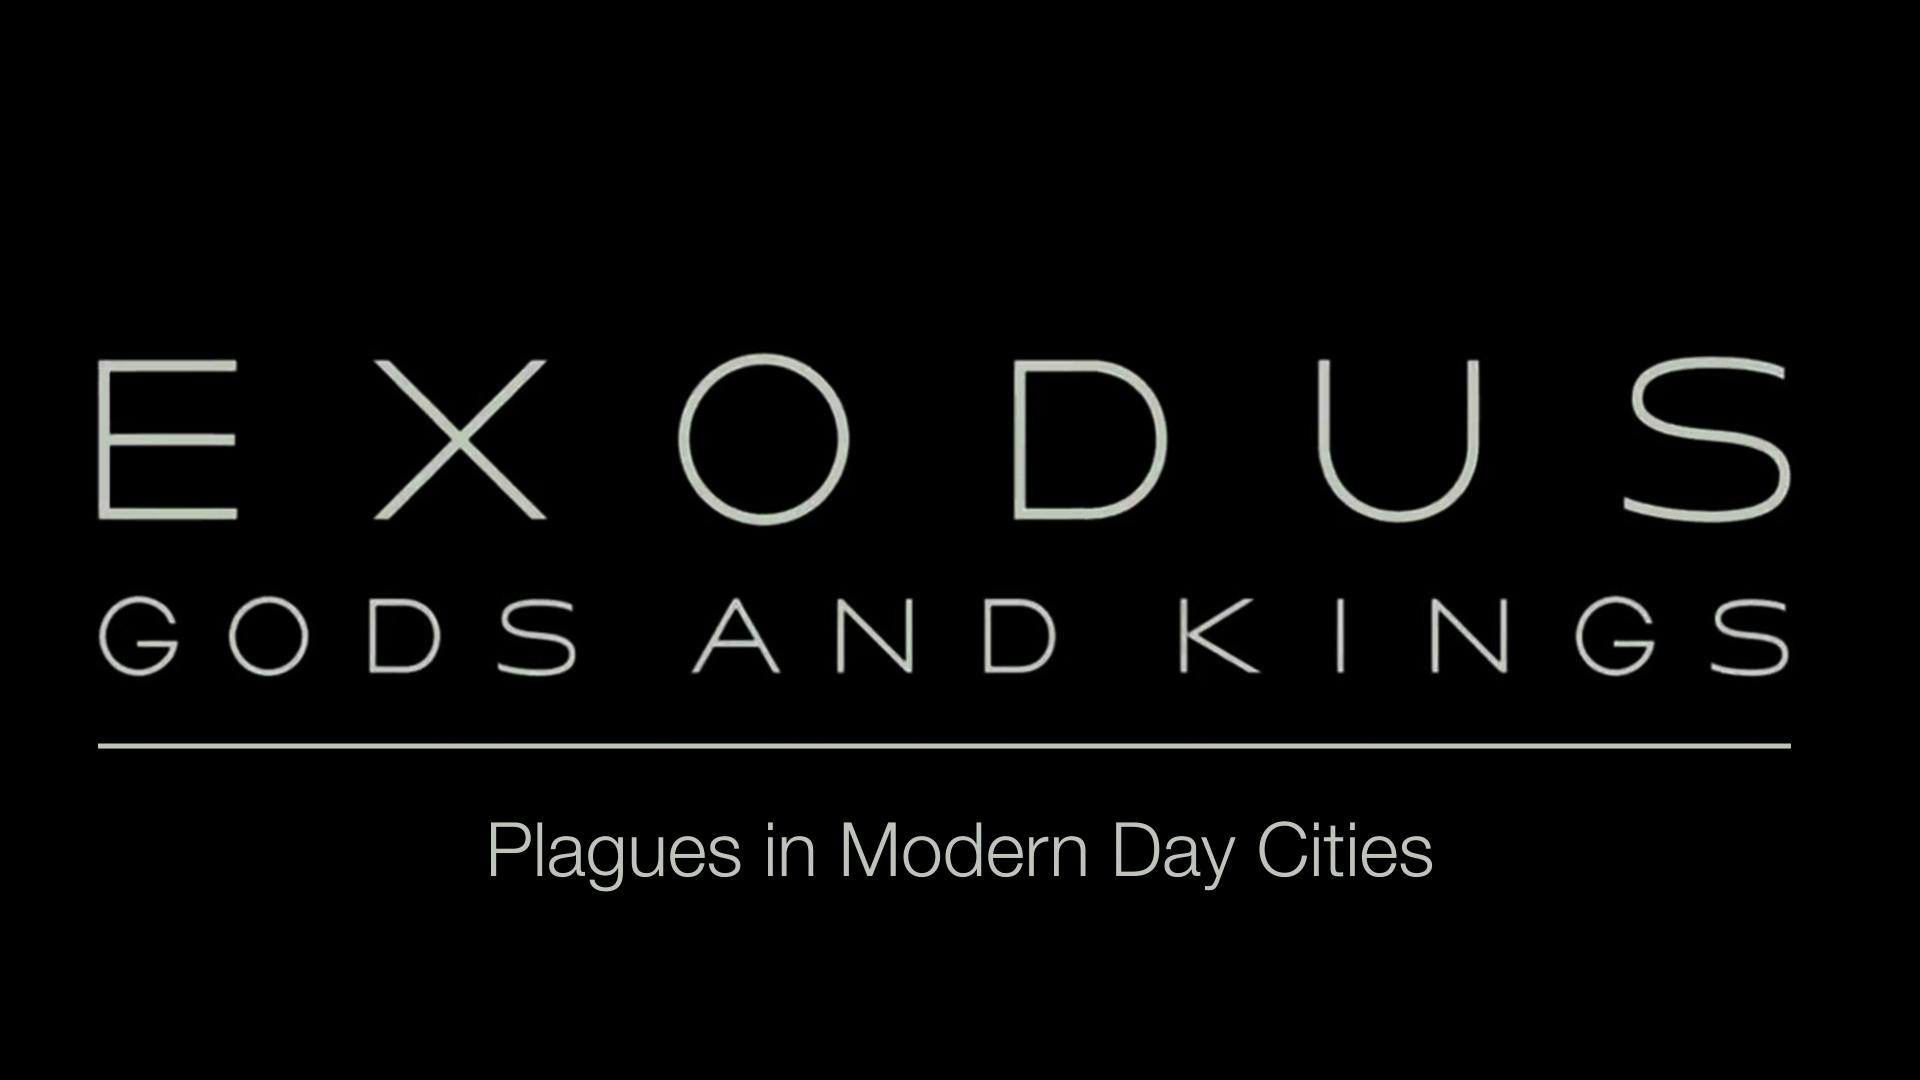 Exodus_Thumbnail_001.jpg